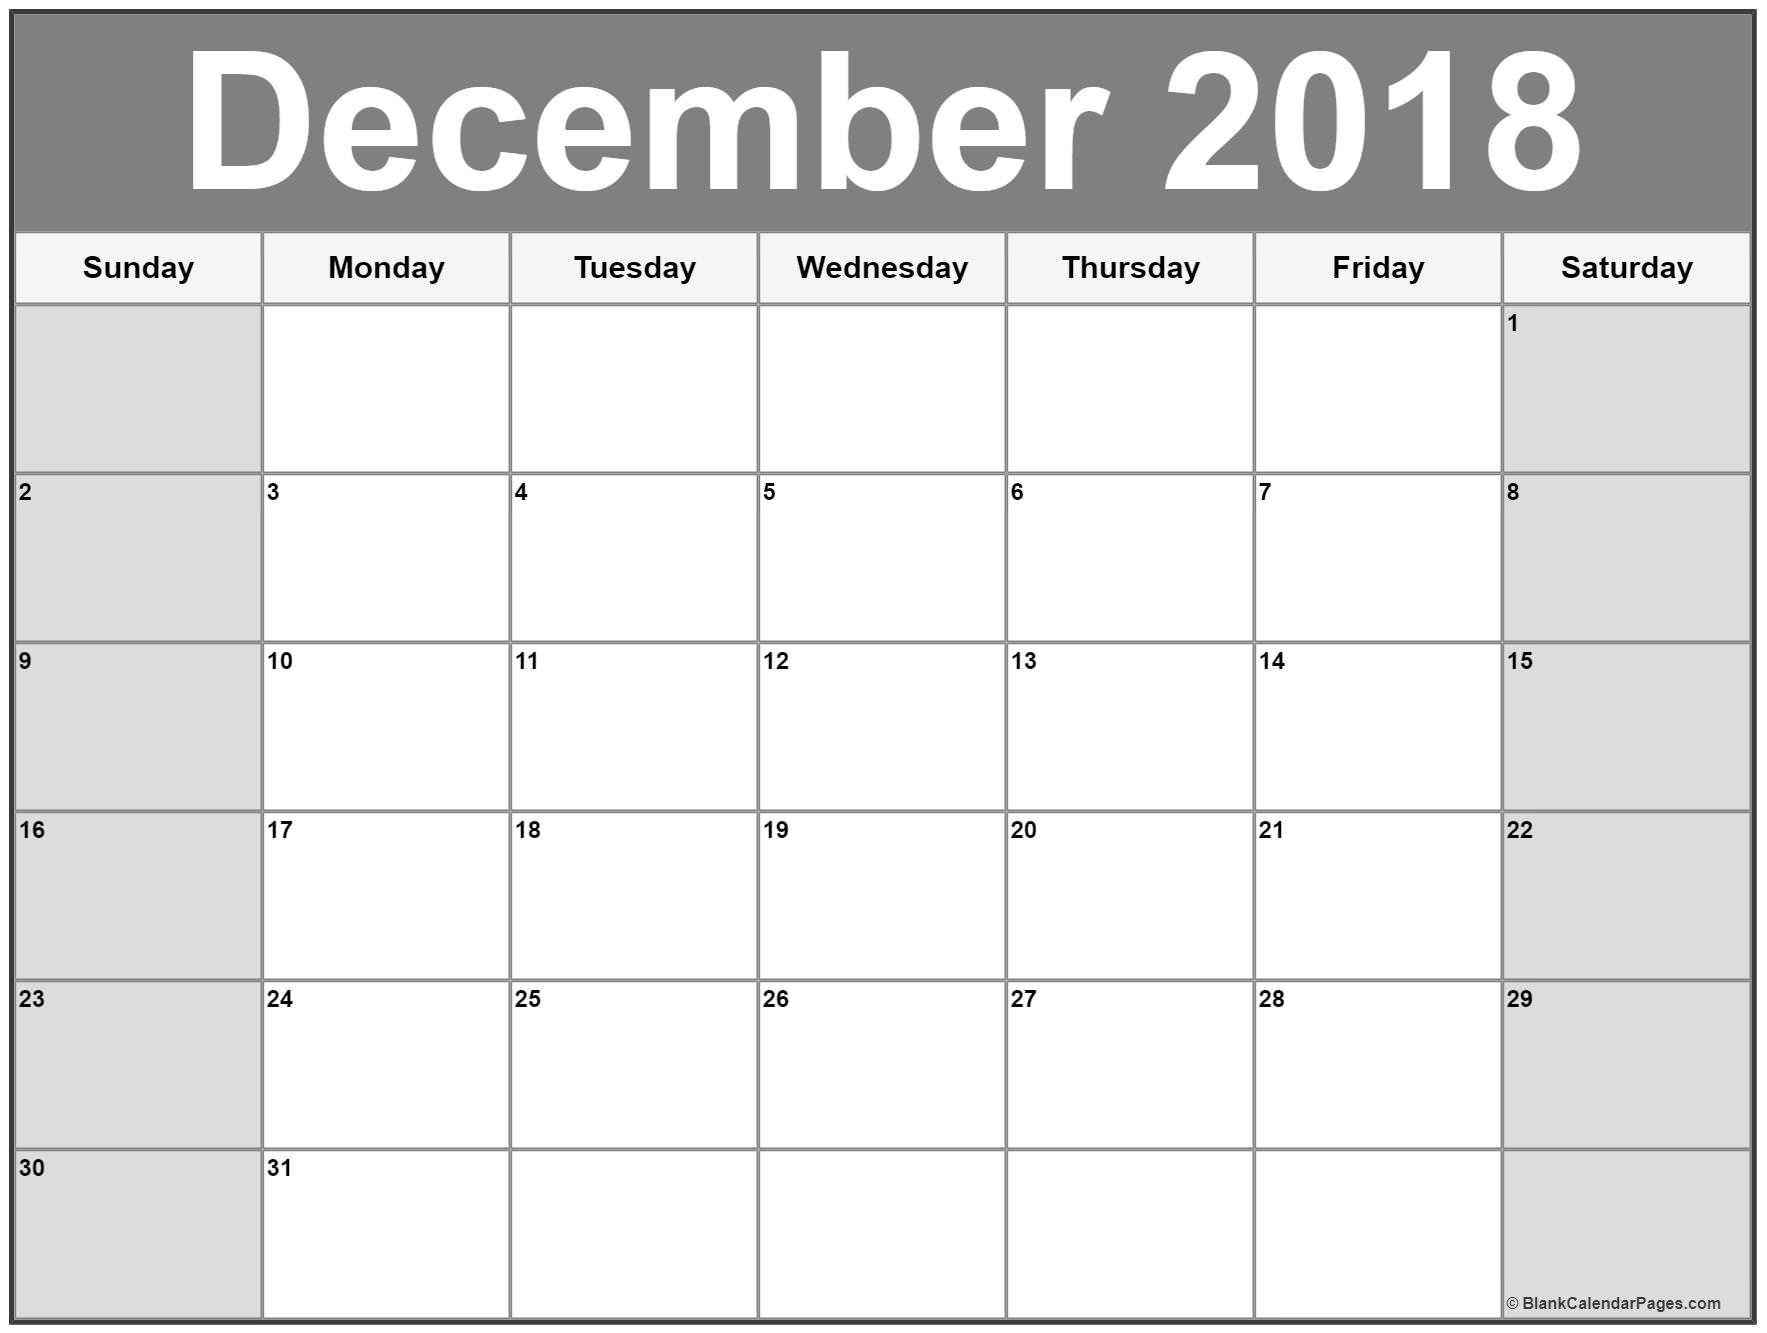 Monthly December 2018 Calendar Blank